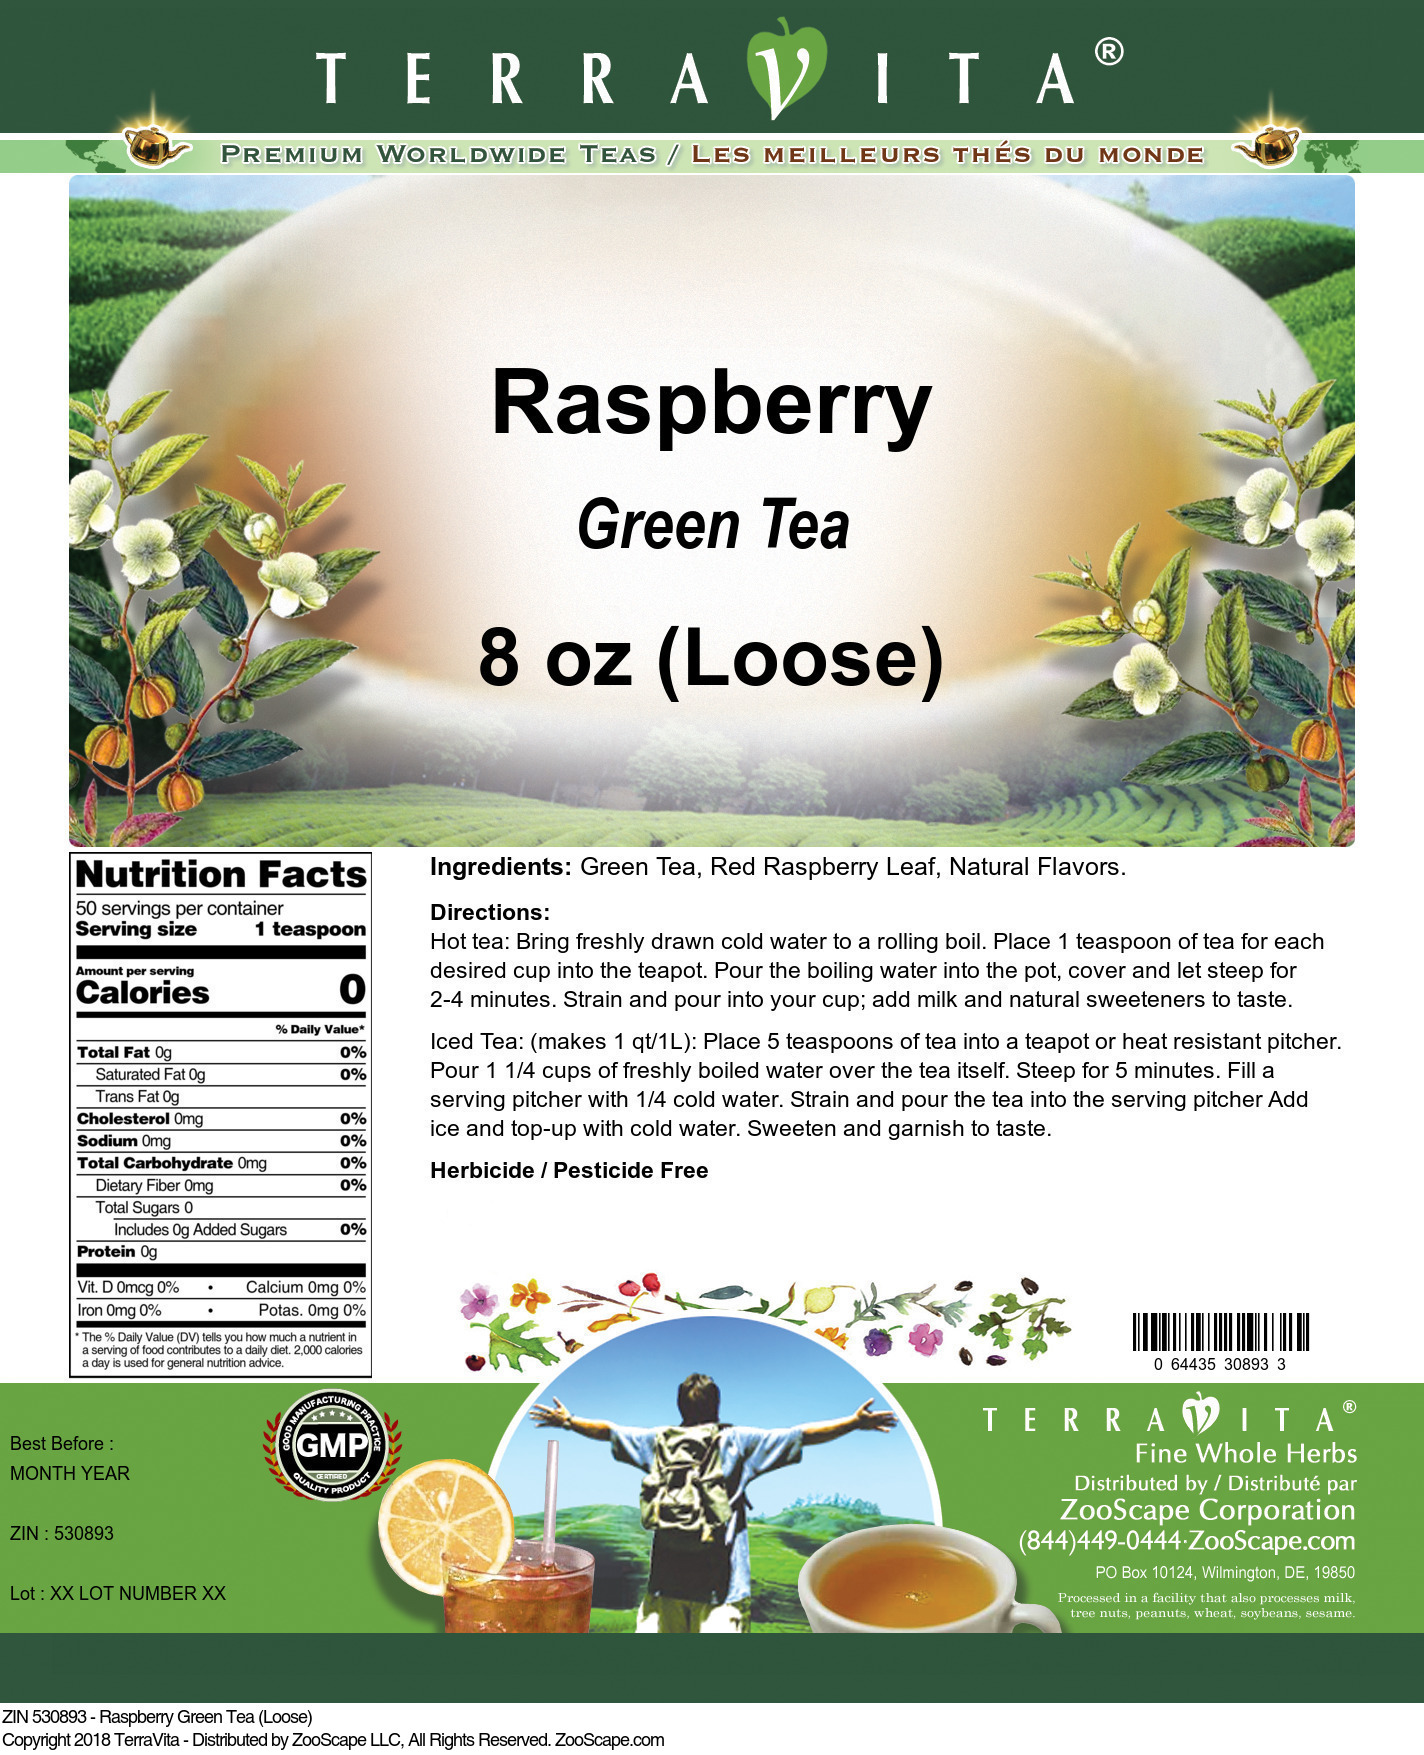 Raspberry Green Tea